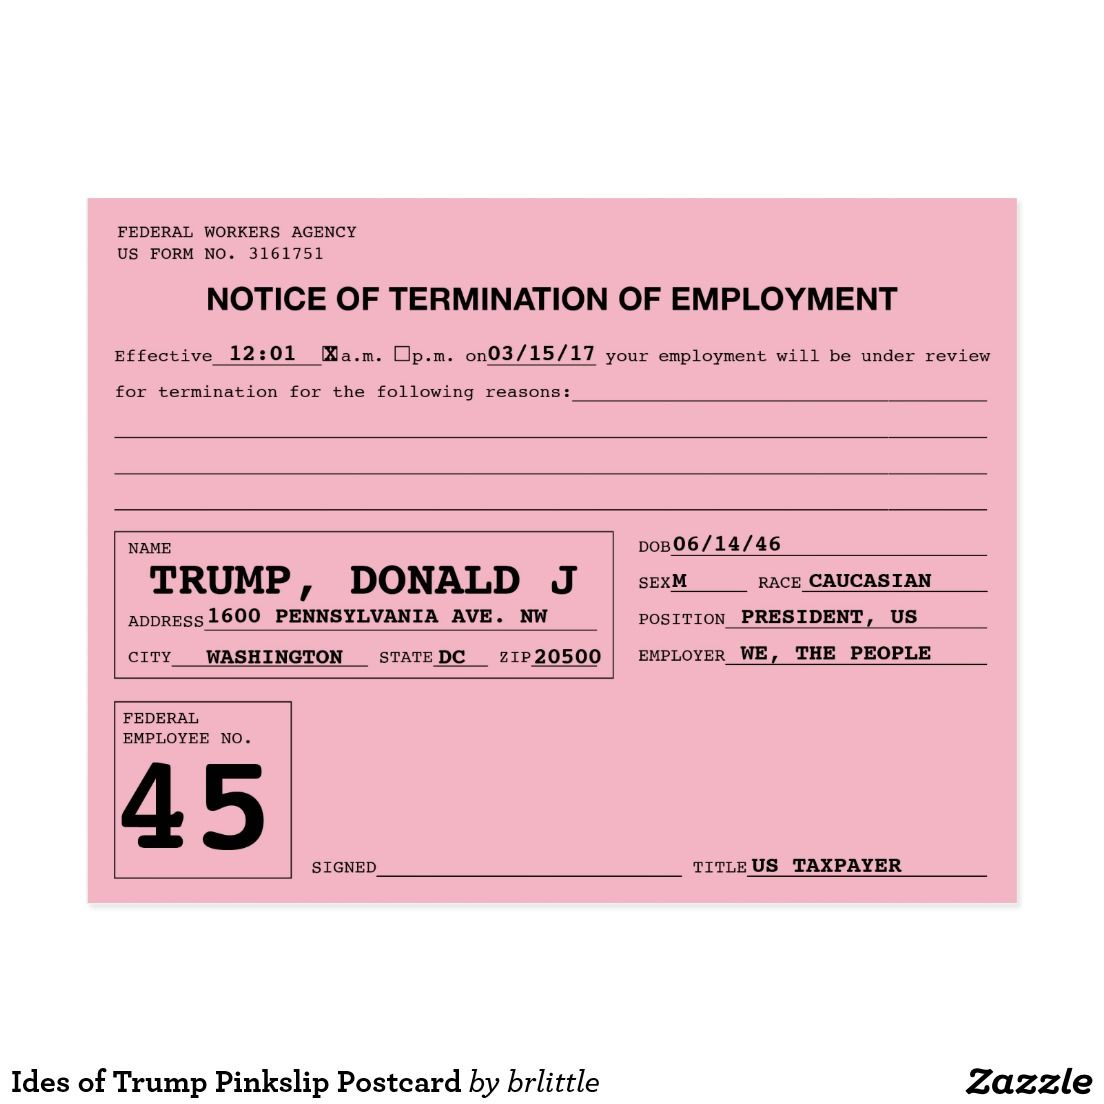 Ides of Trump Pinkslip Postcard | Bernie sander